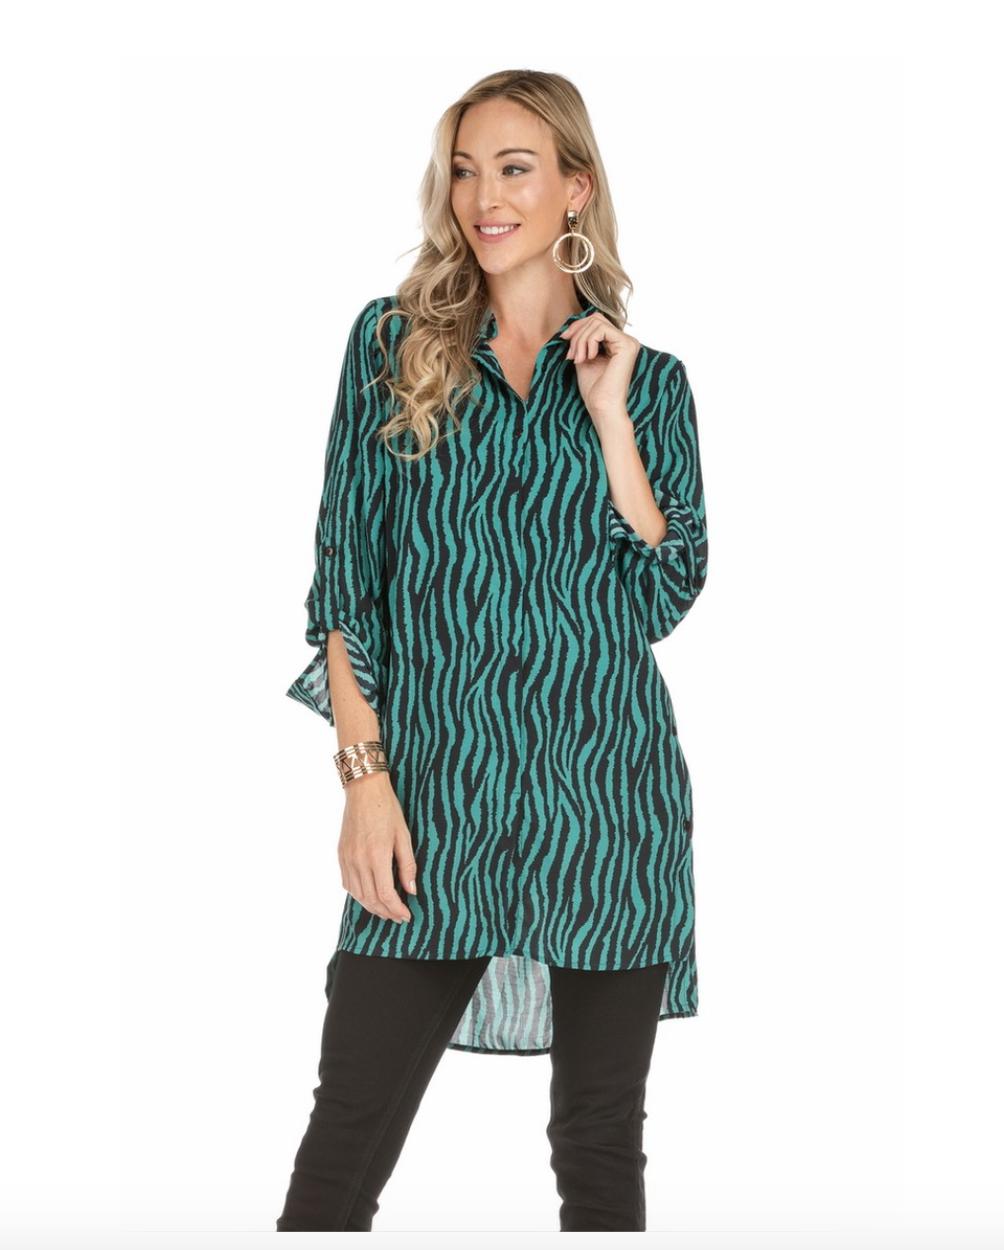 Teal Zebra Tunic/Dress